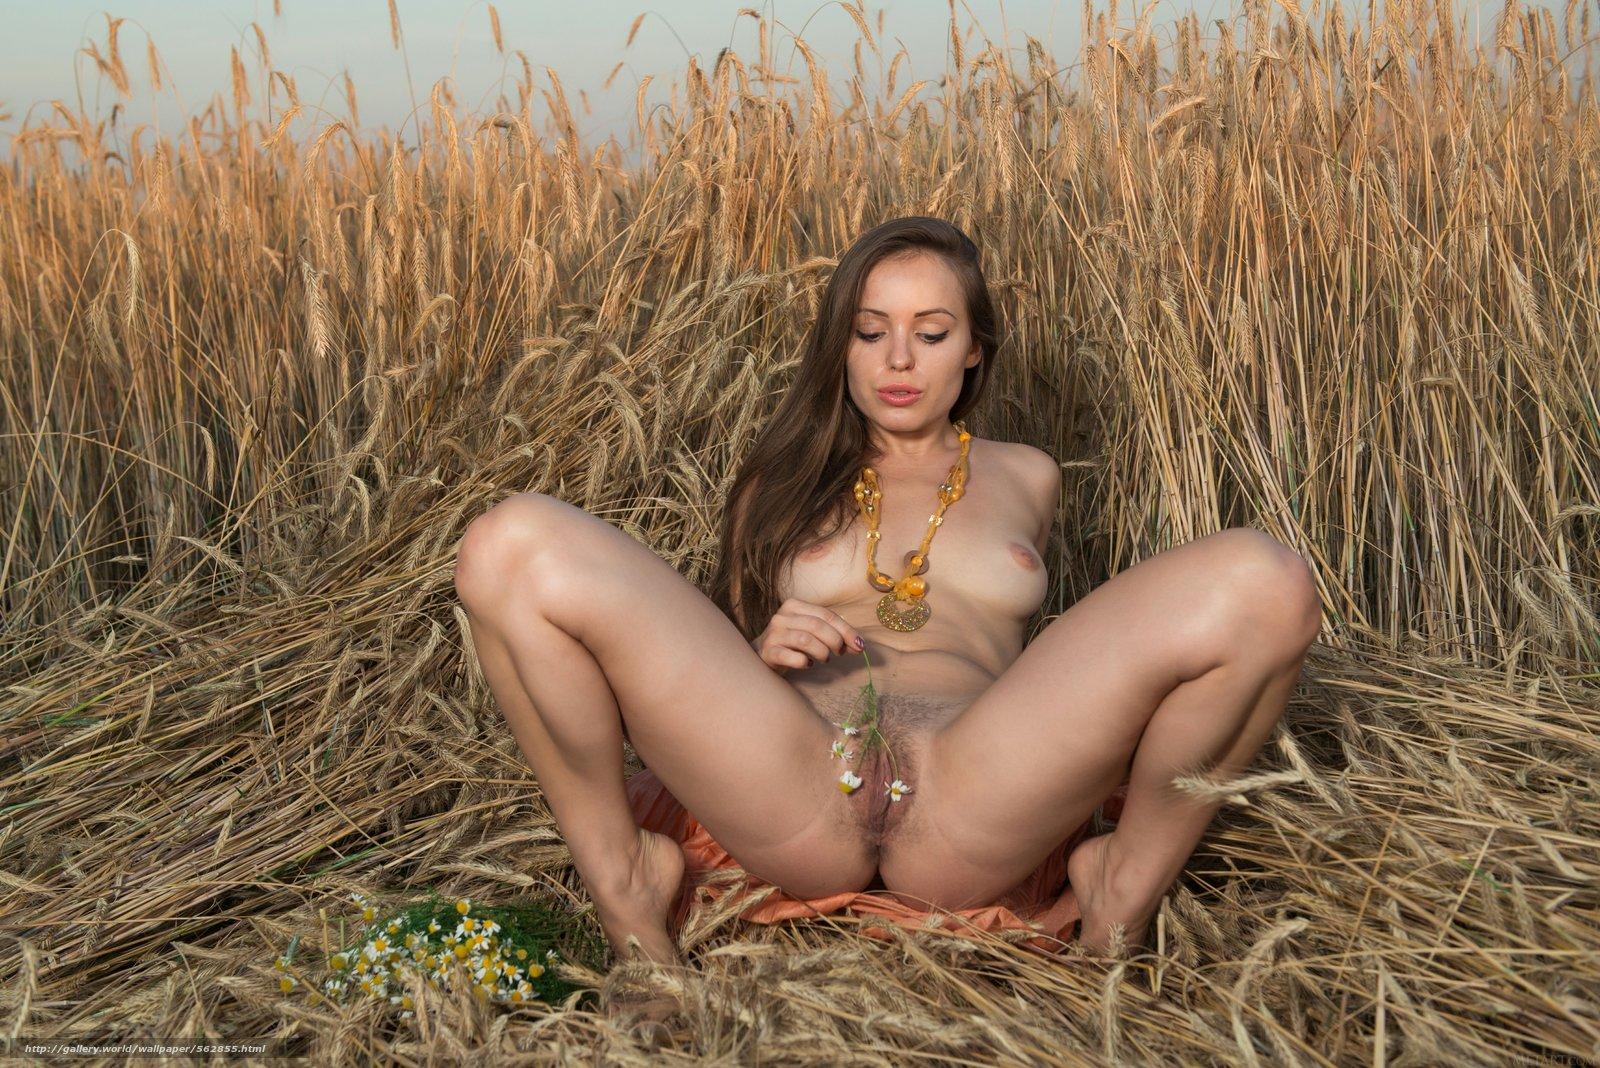 Руслана пысанка порнофото